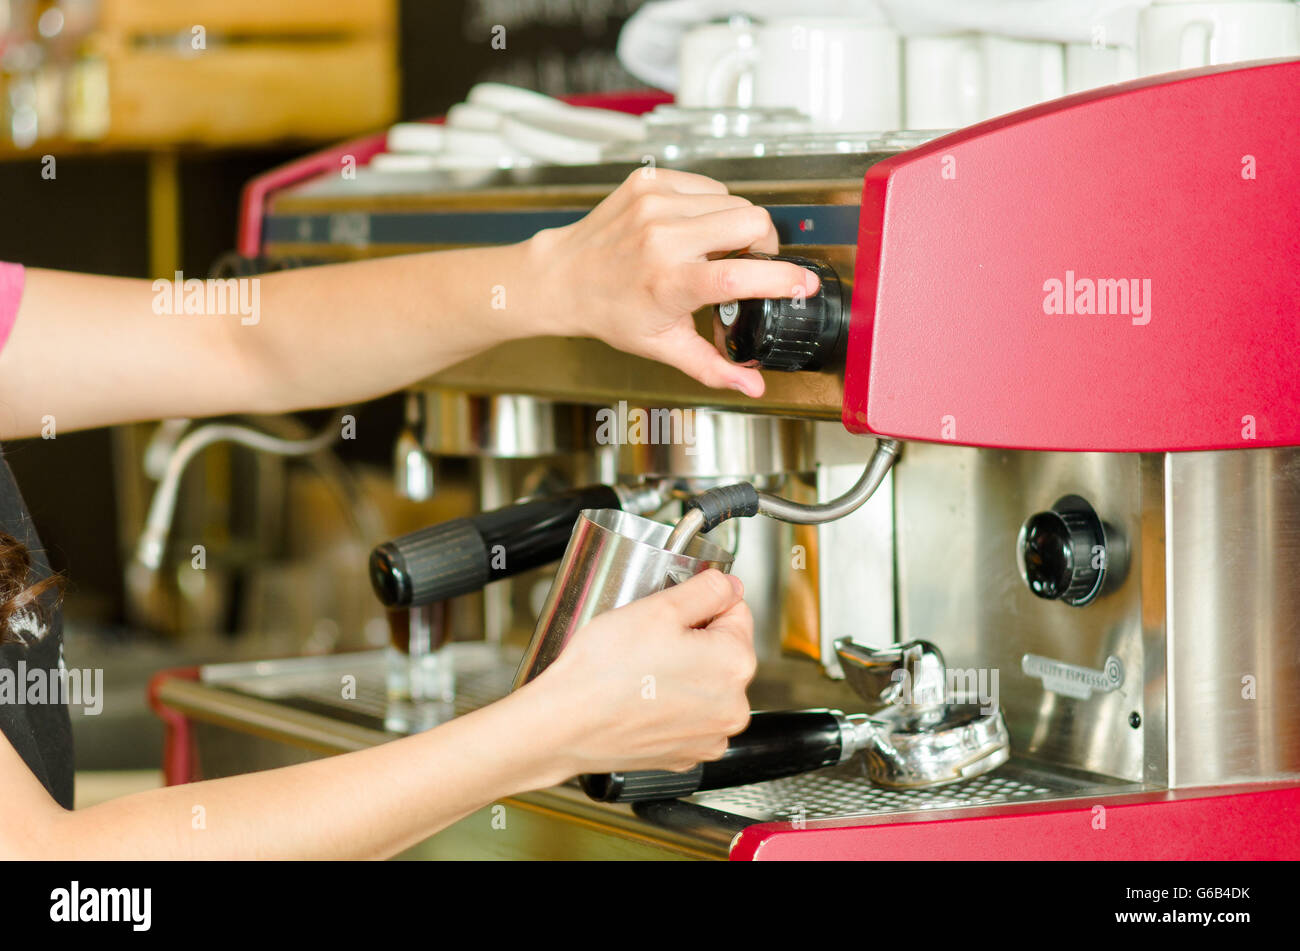 female hands working operating industrial coffee maker steaming milk in metal container - Industrial Coffee Maker